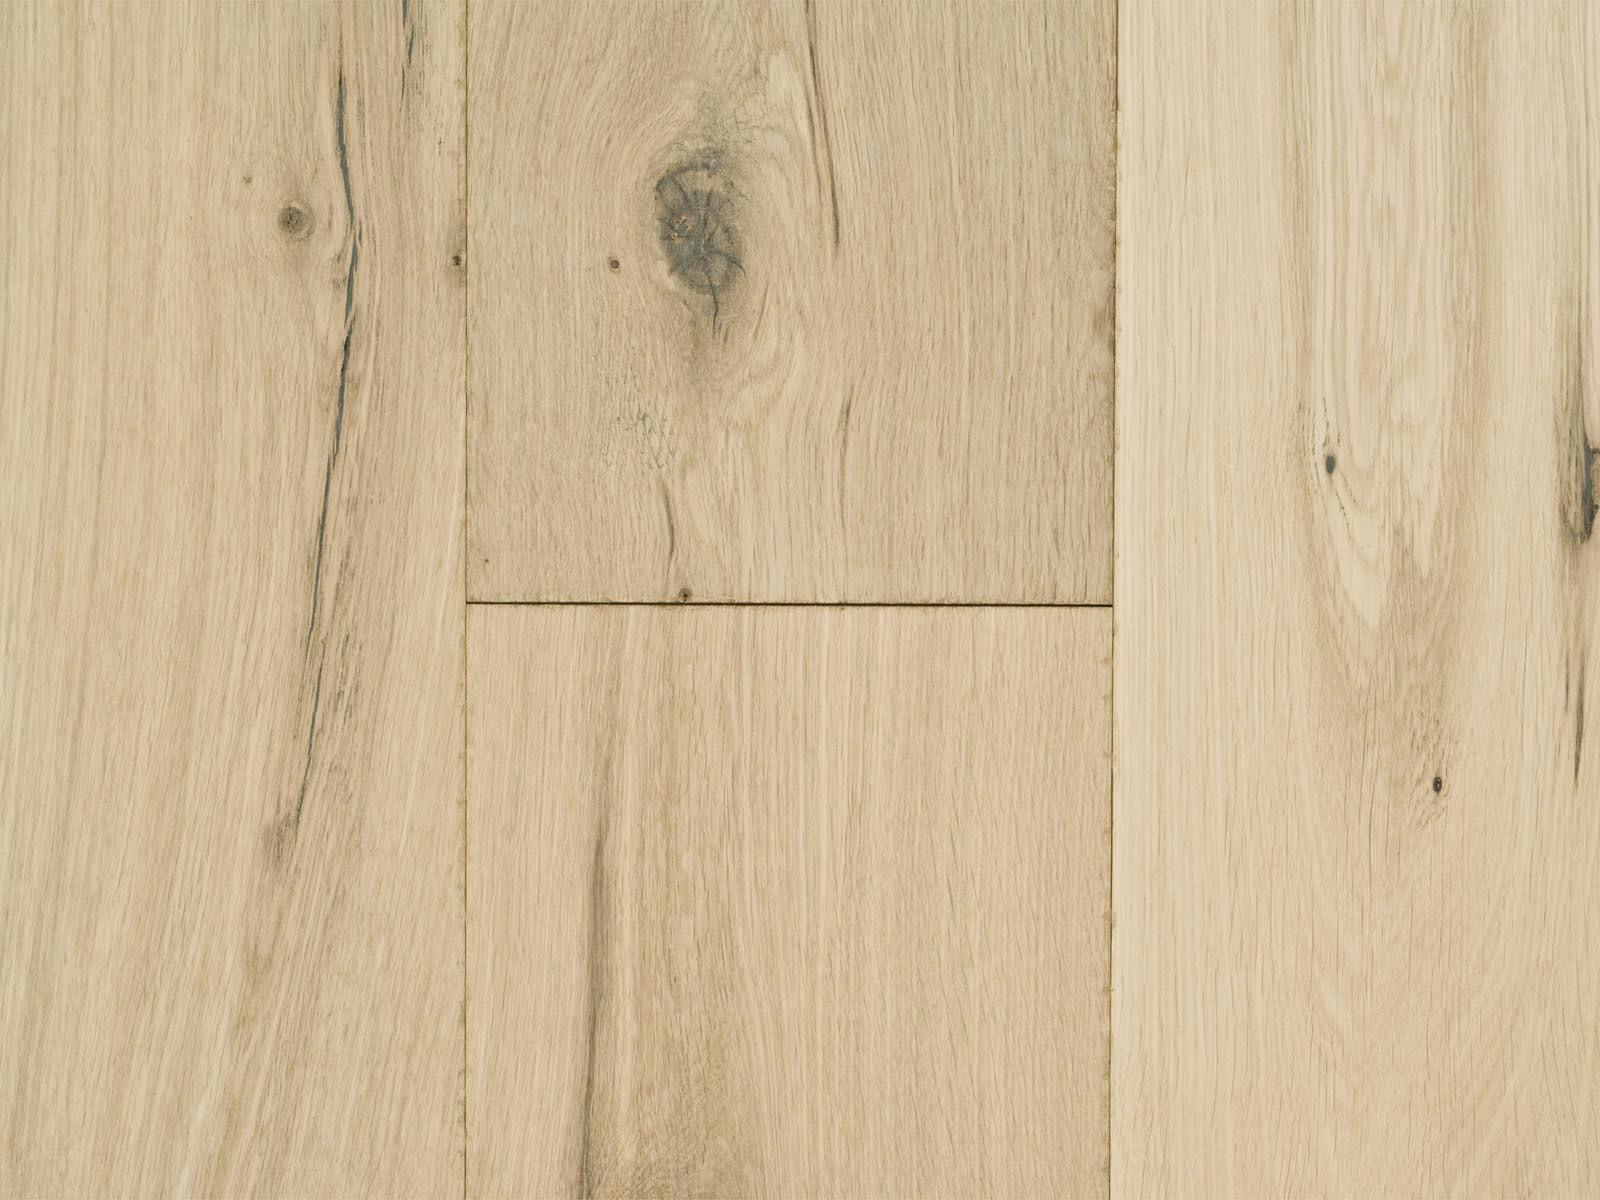 mohawk hickory hardwood flooring of duchateau hardwood flooring houston tx discount engineered wood with white oiled european oak